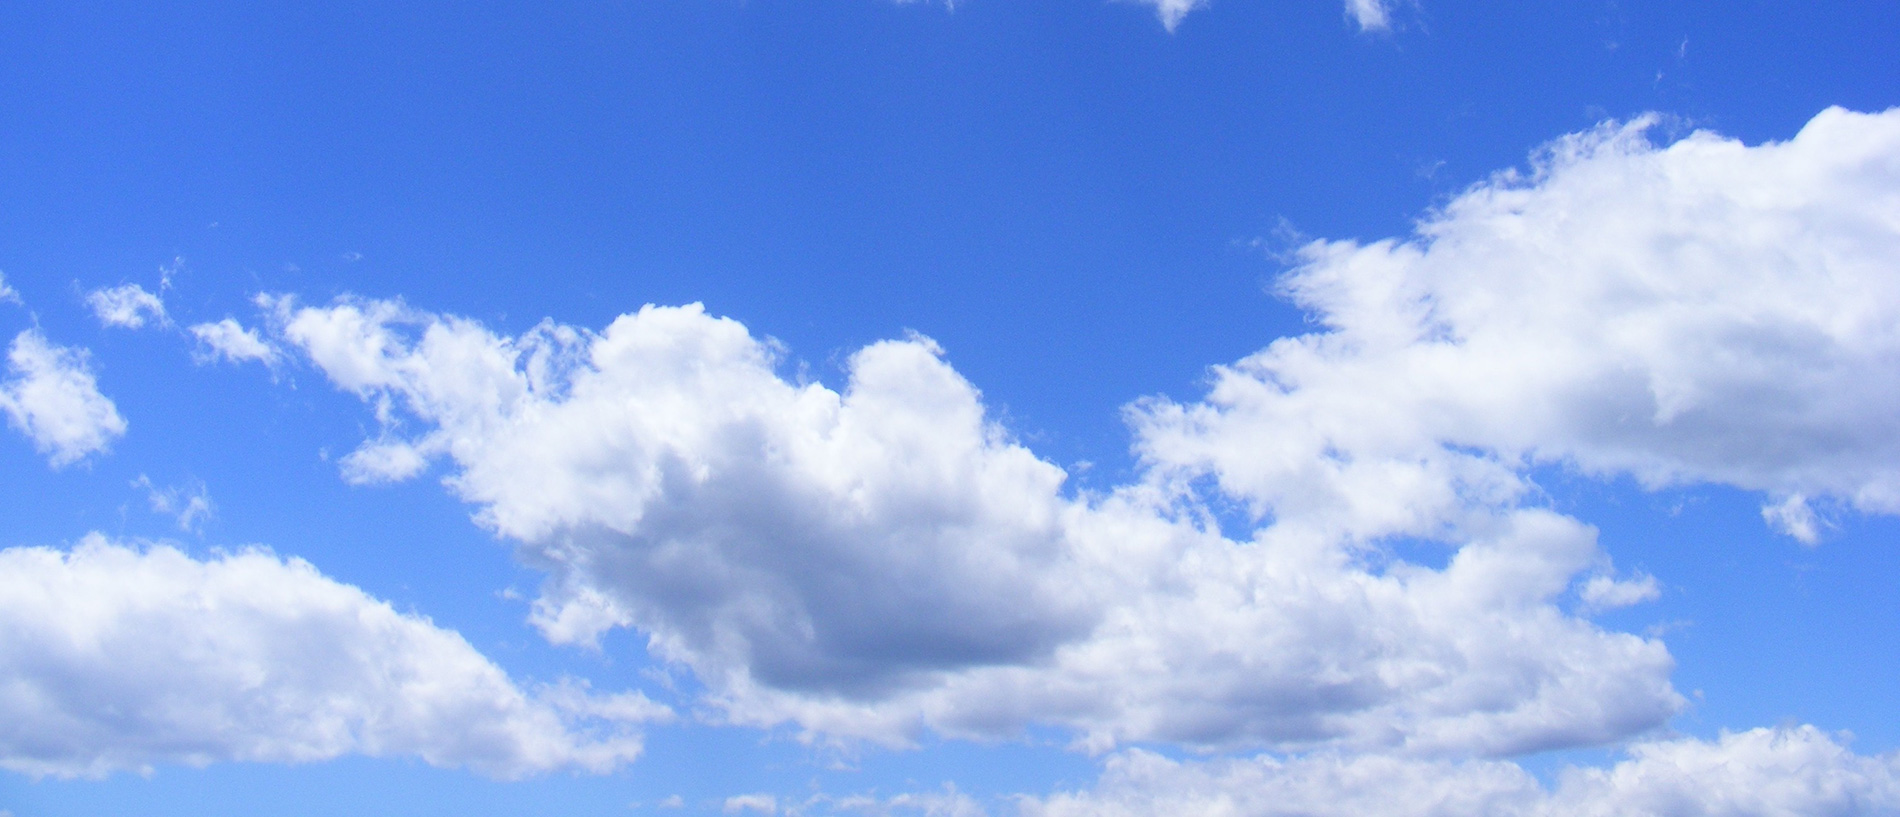 cloud-background